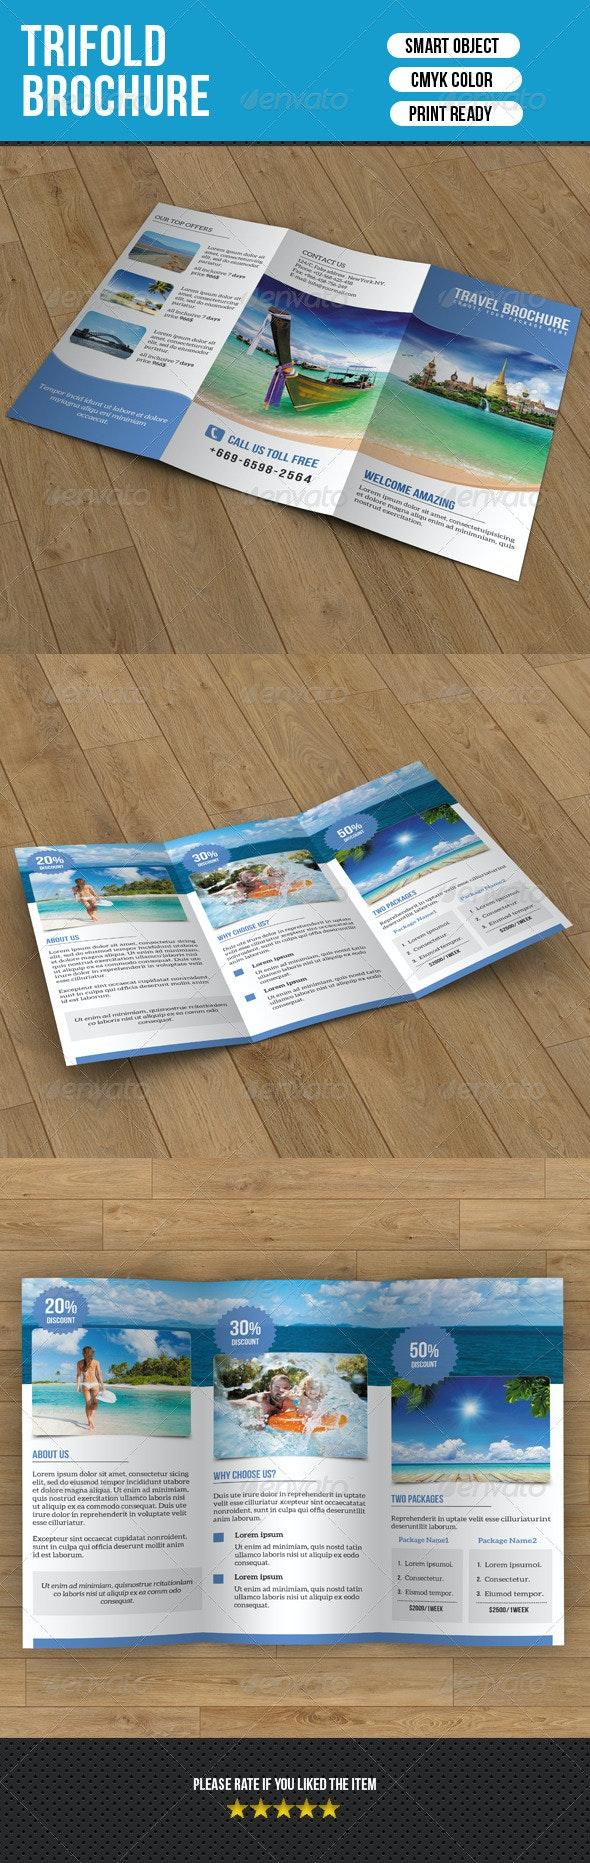 Travel Trifold Brochure-V52 - Corporate Brochures